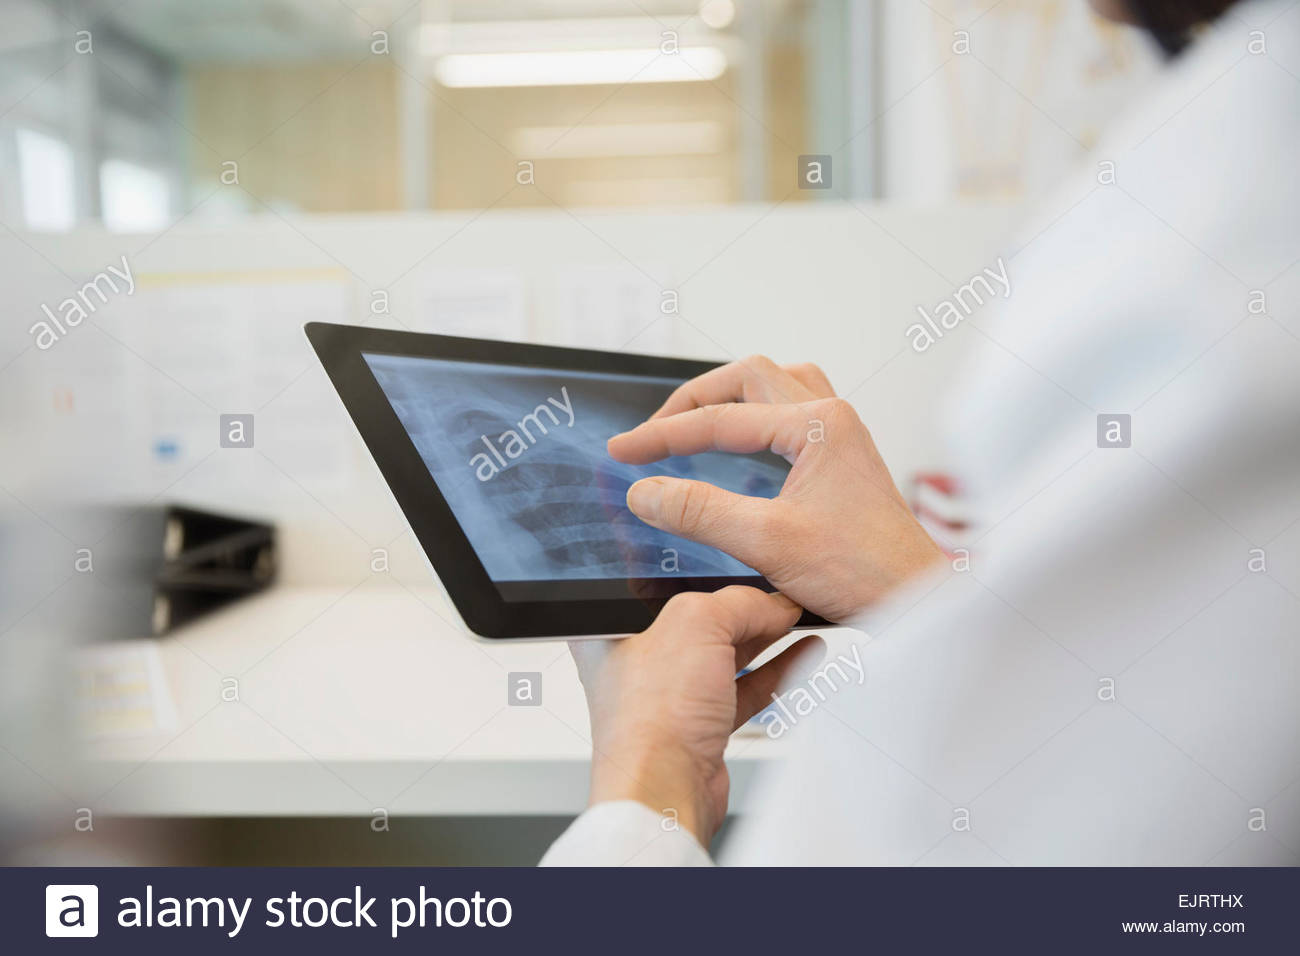 Doctor examining x-ray on digital tablet - Stock Image